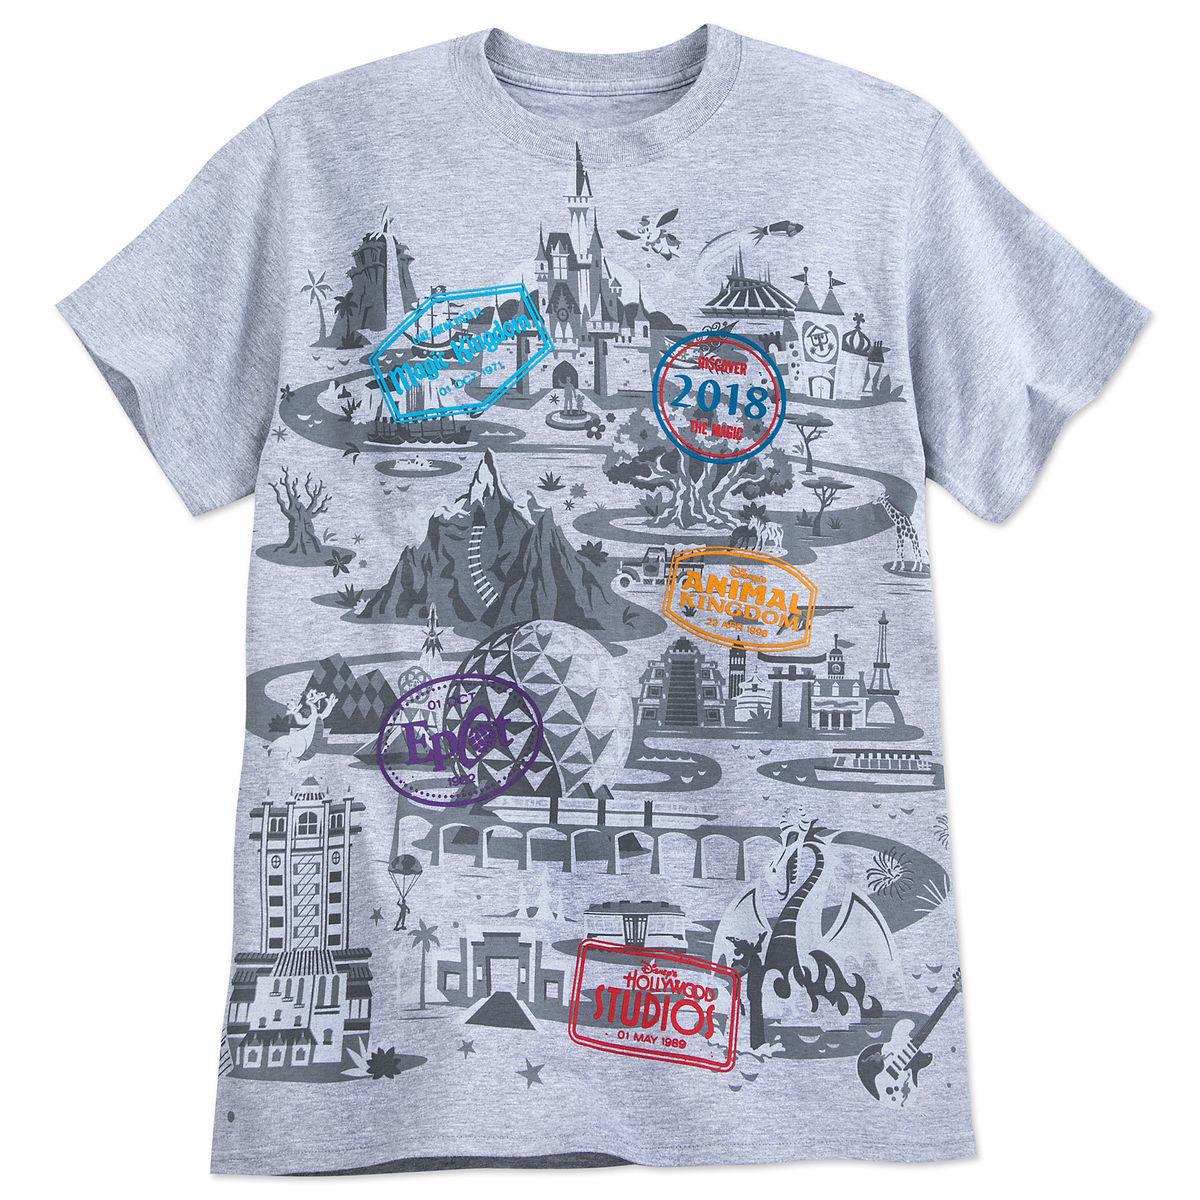 Walt Disney World Map With Hotels.Walt Disney World Map T Shirt For Adults 2018 Shopdisney